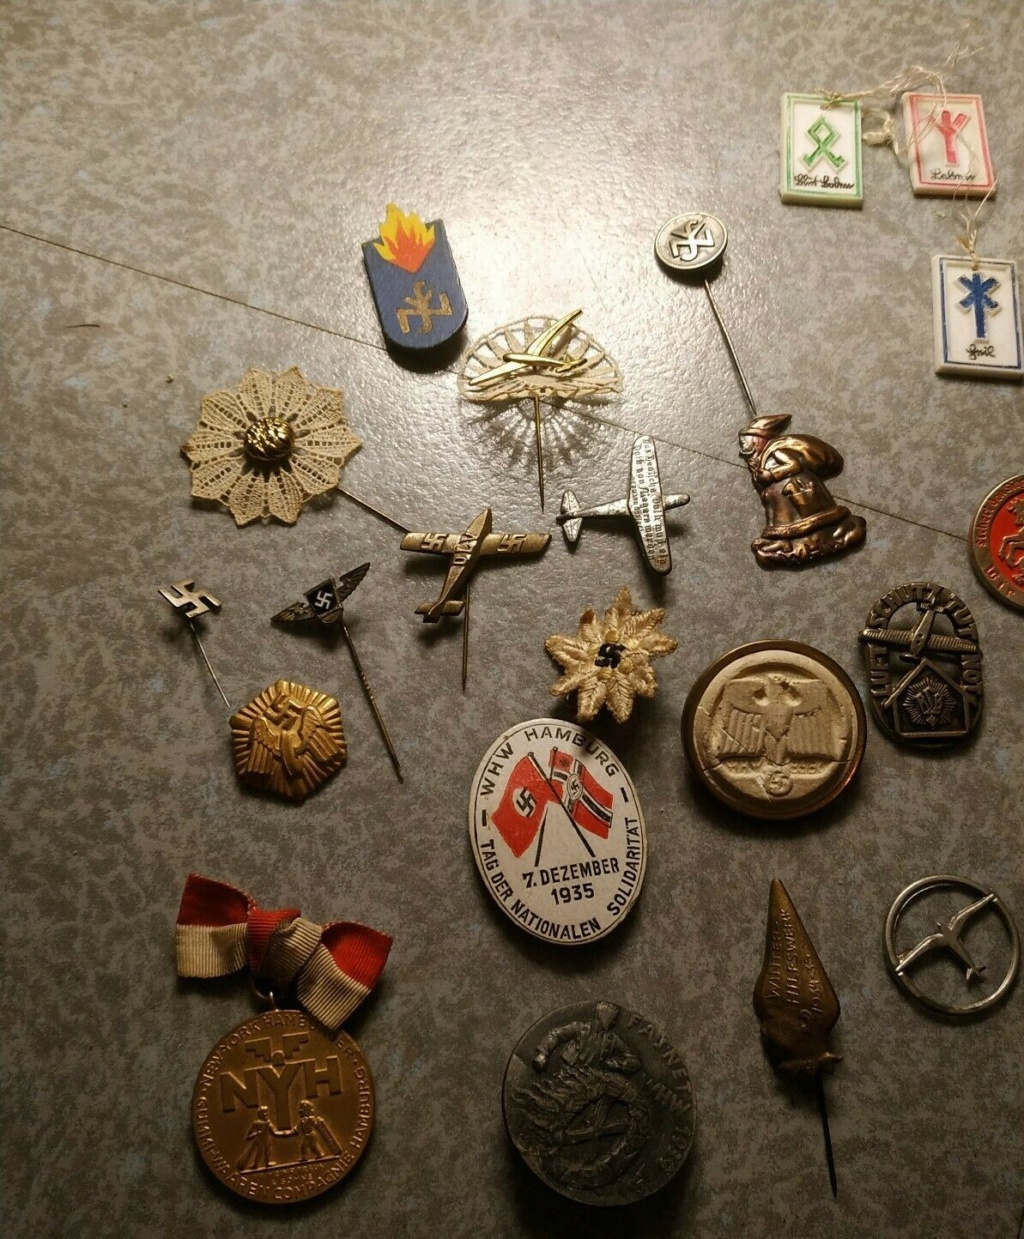 Lot insignes III Reich Vichy FFI à authentifier? S-l16014